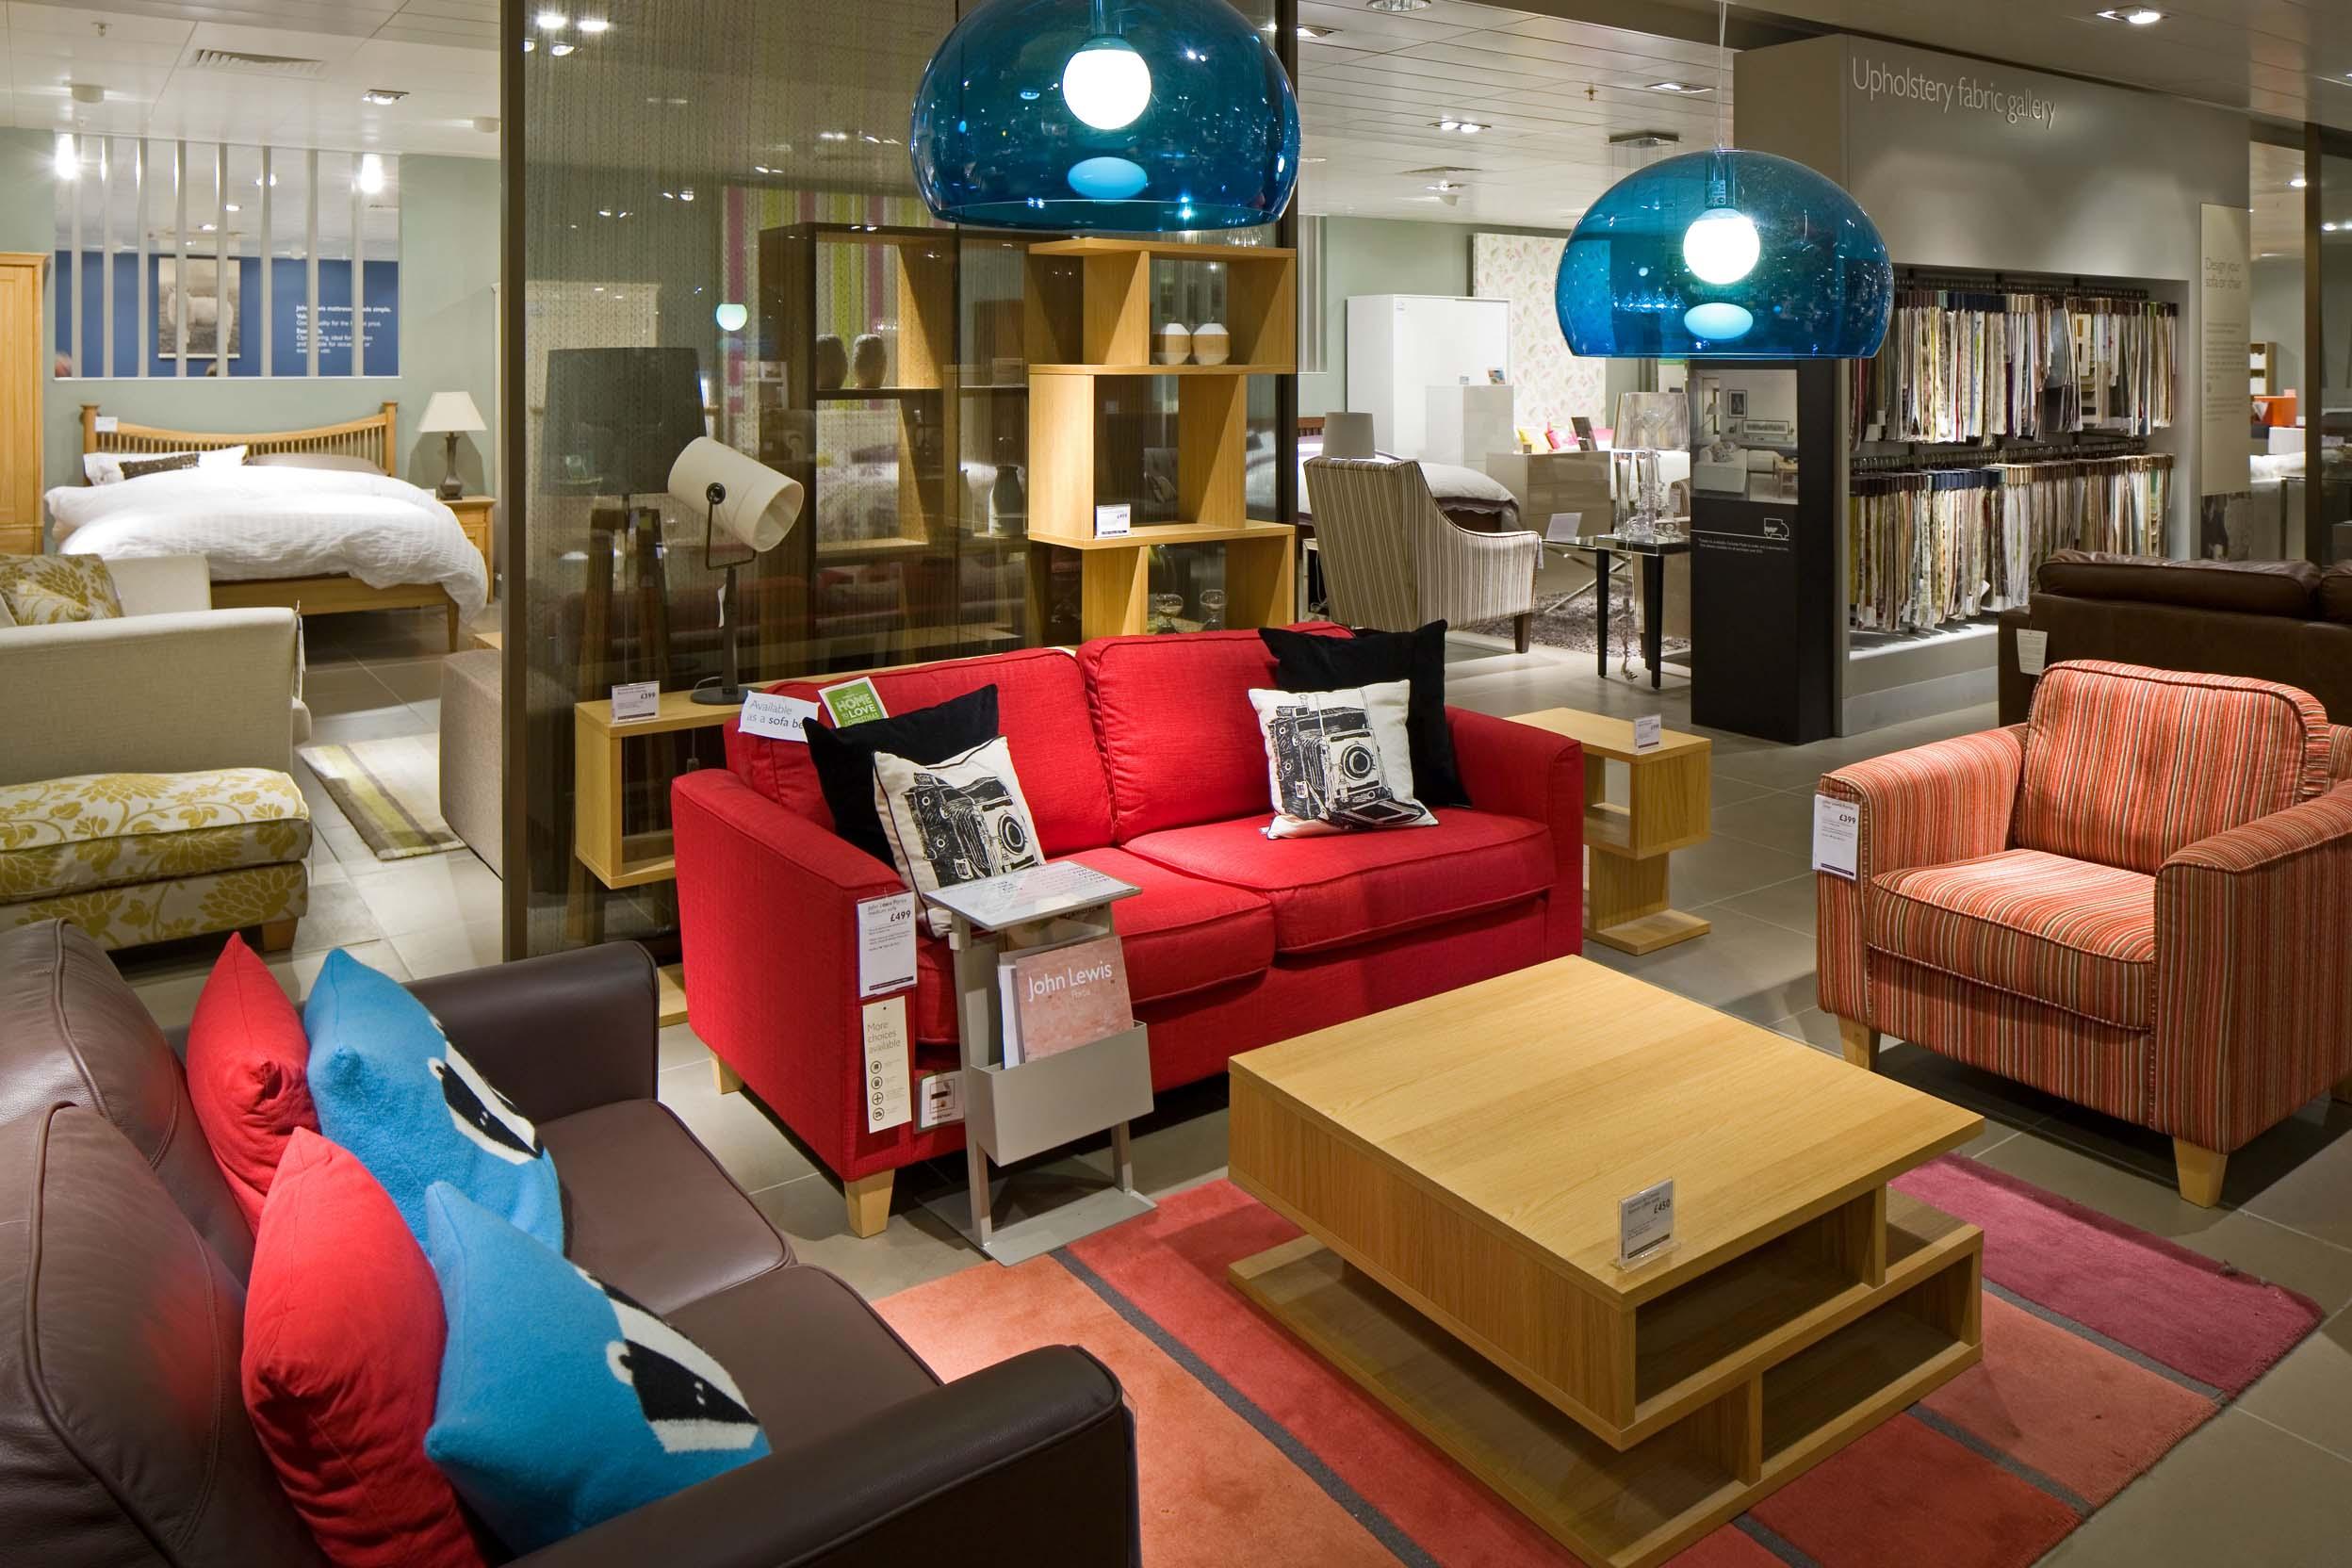 Sofa milton keynes refil sofa - Litera sofa carrefour ...